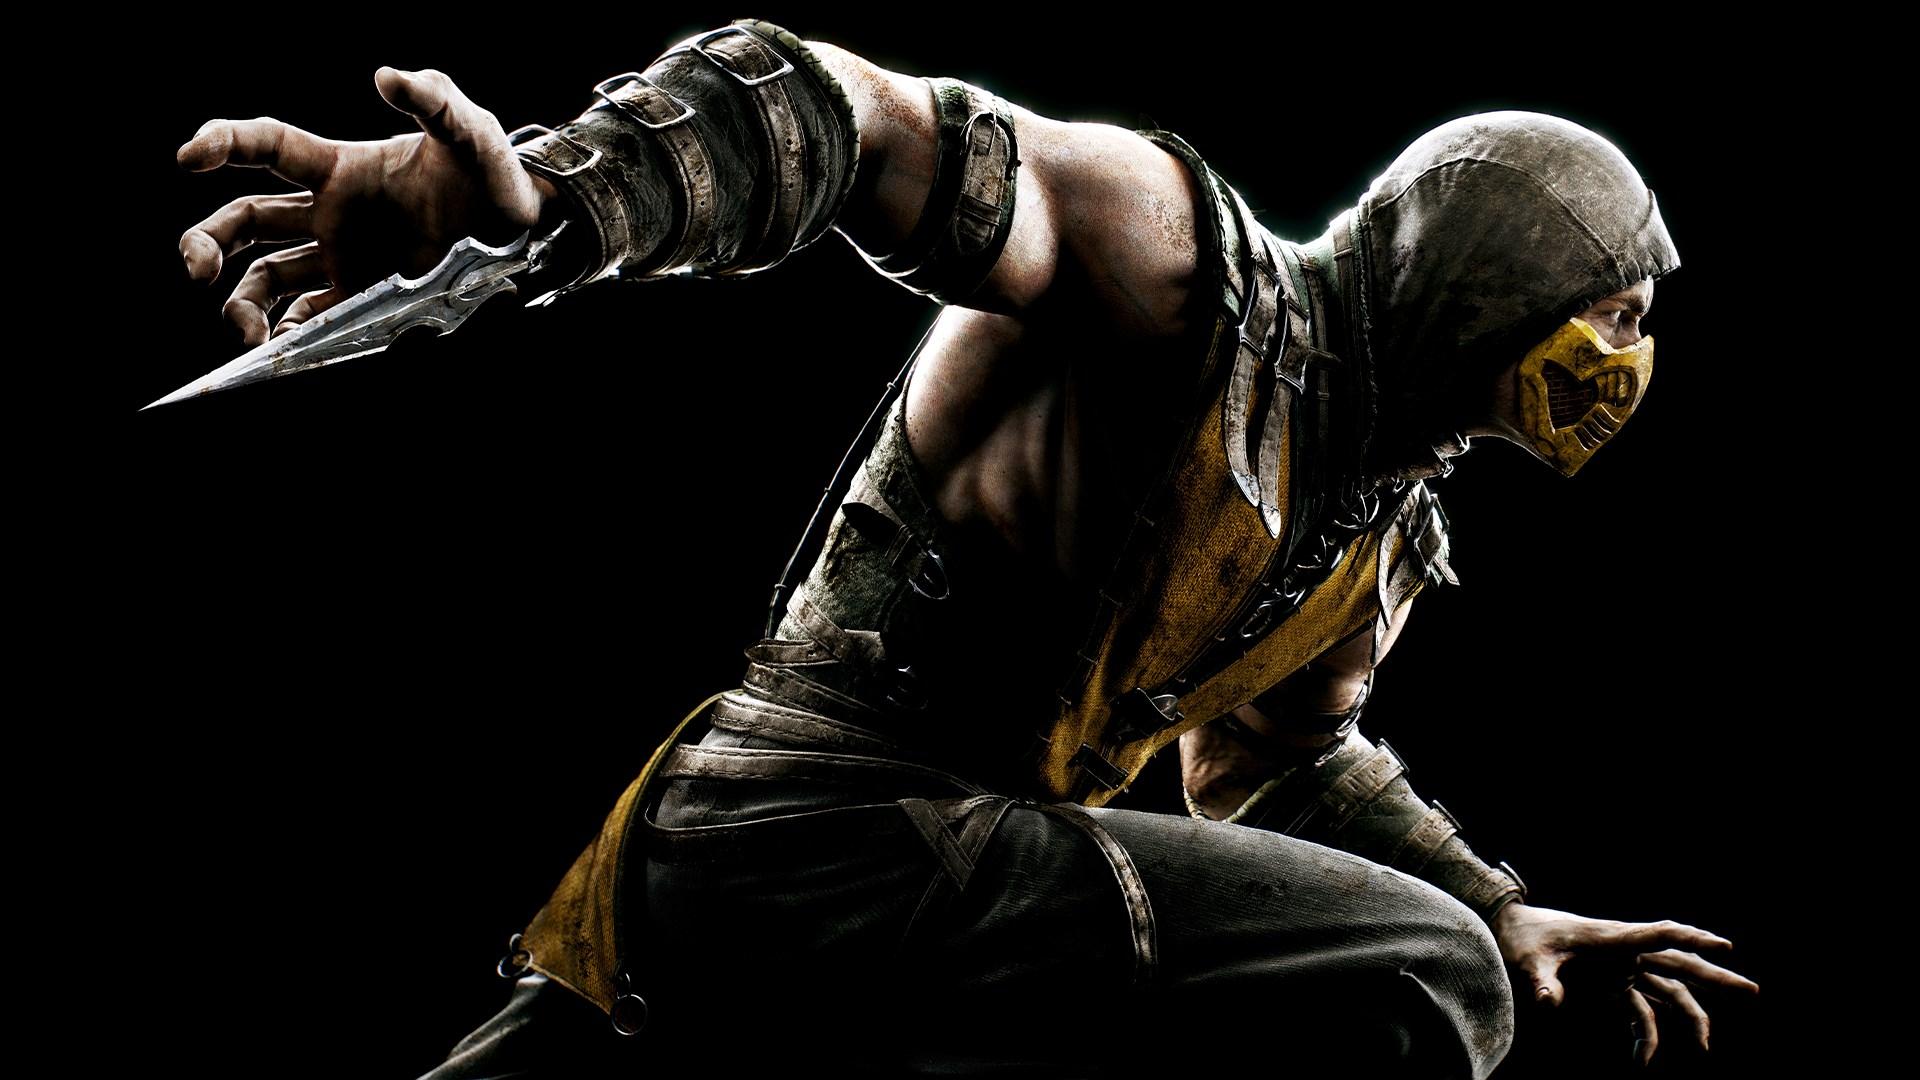 Buy Mortal Kombat X - Microsoft Store